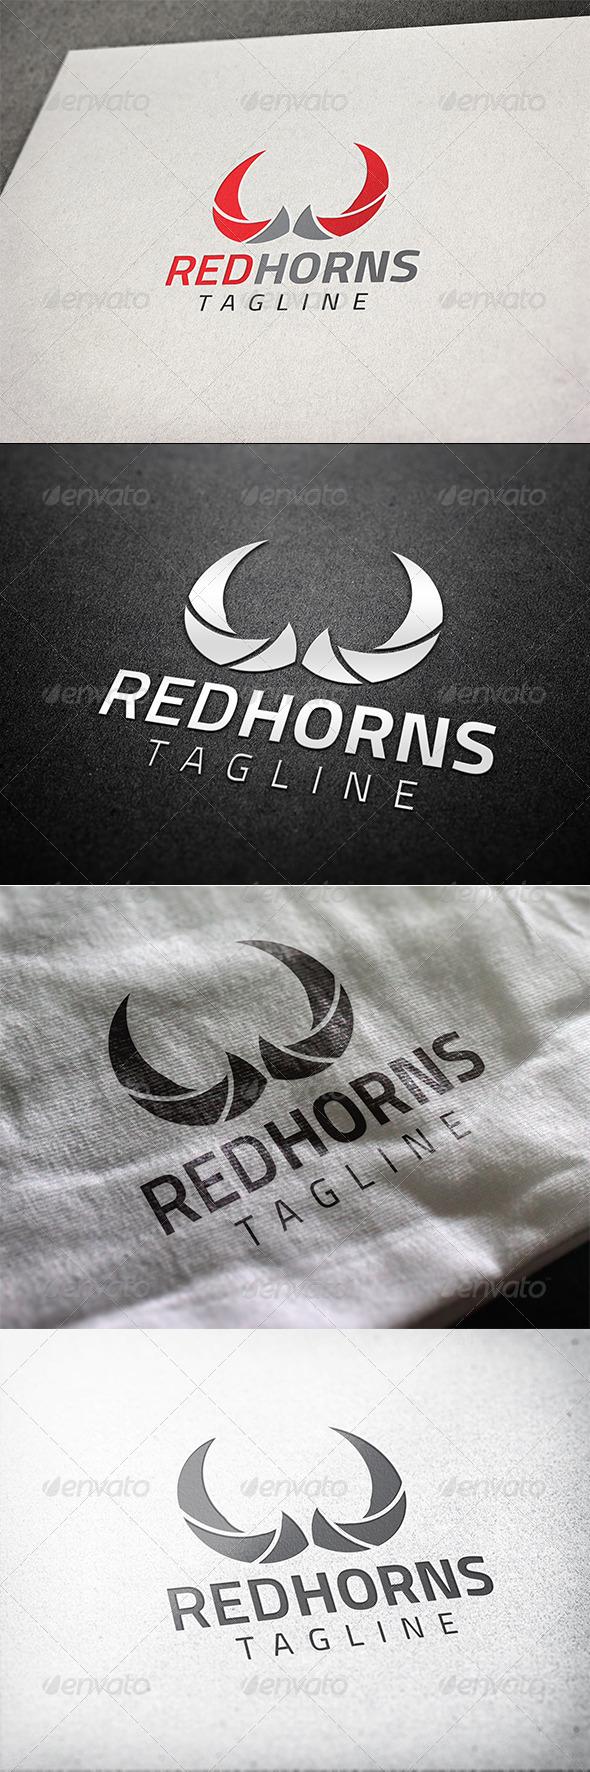 Redhorns Logo - Abstract Logo Templates